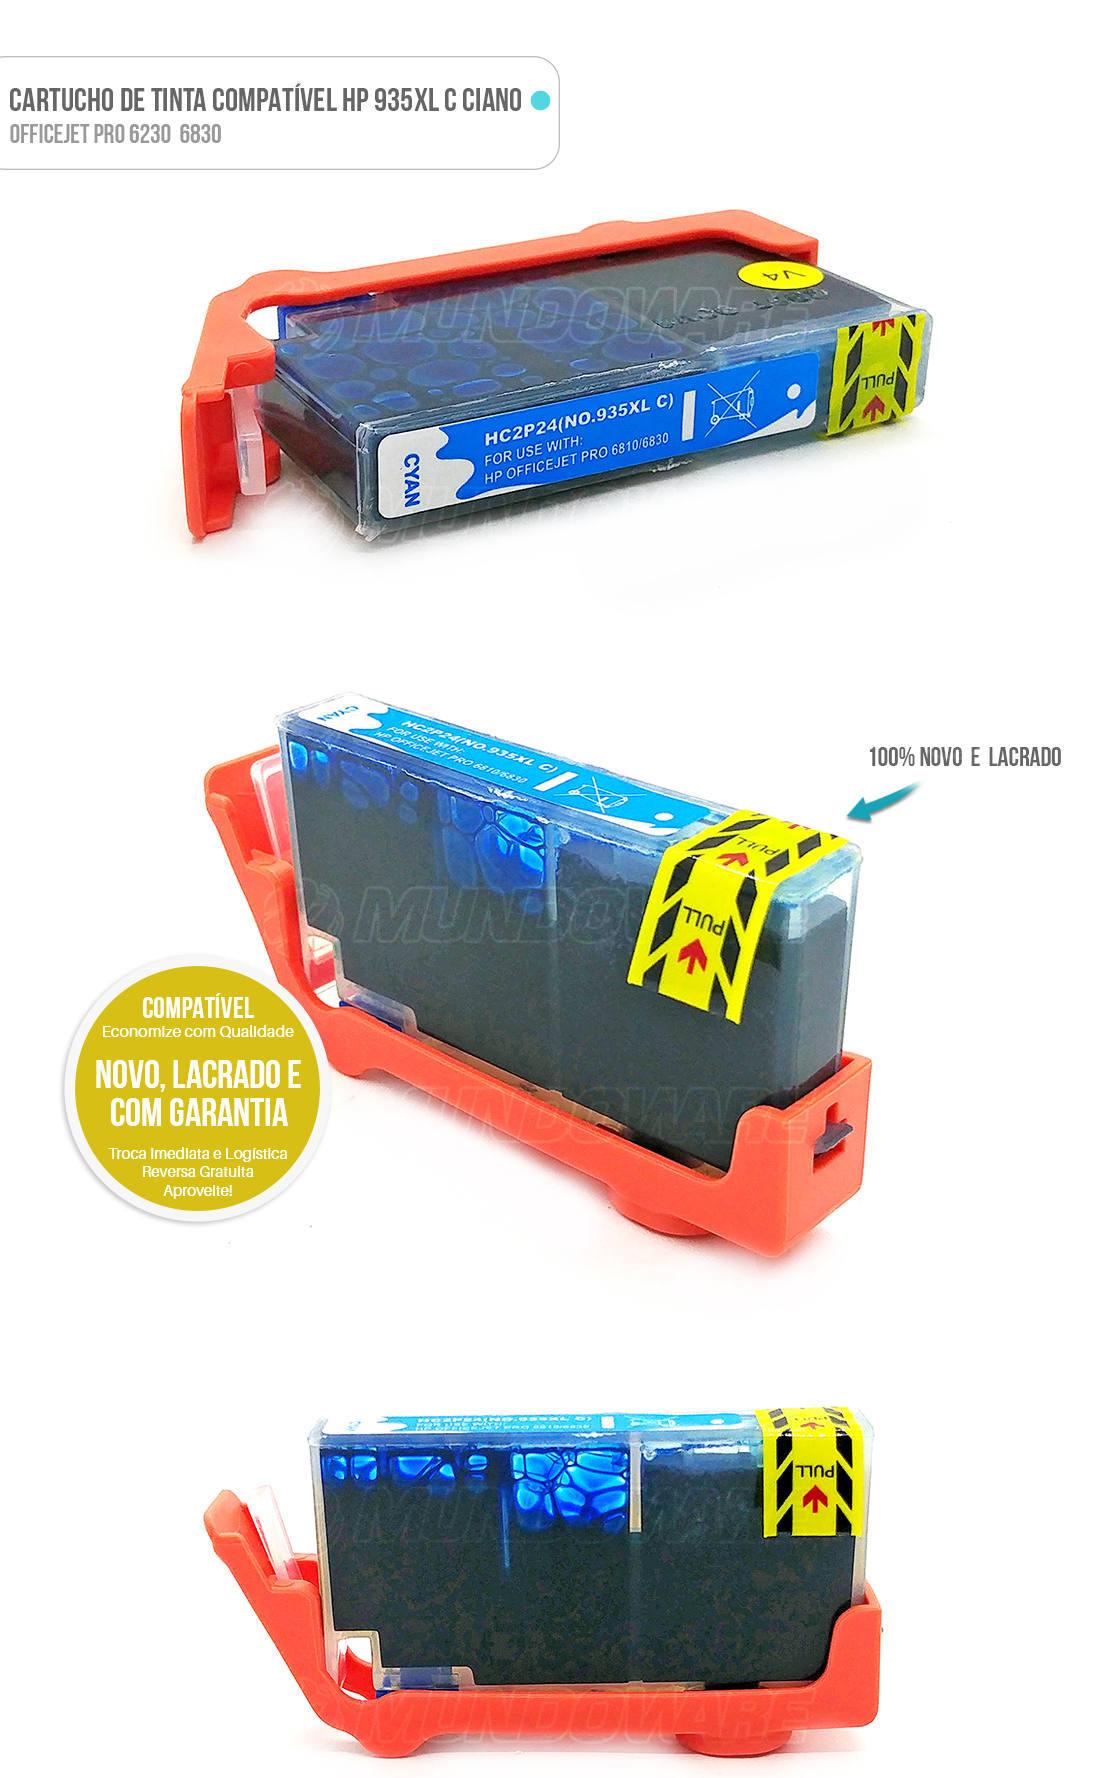 Cartucho de Tinta compatível 935xl 935 xl Ciano para impressora 6230 6830